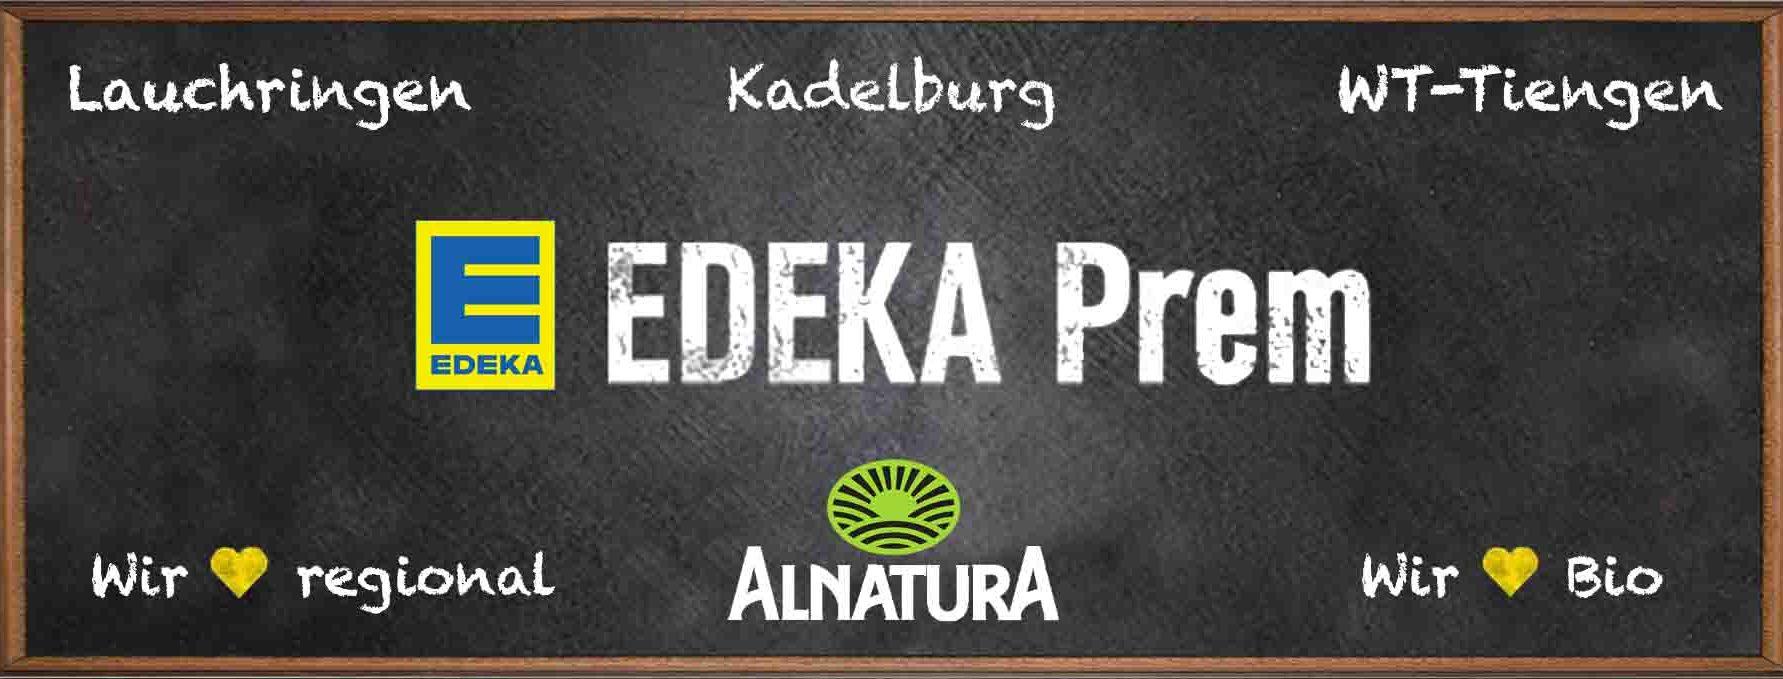 EDEKA Prem